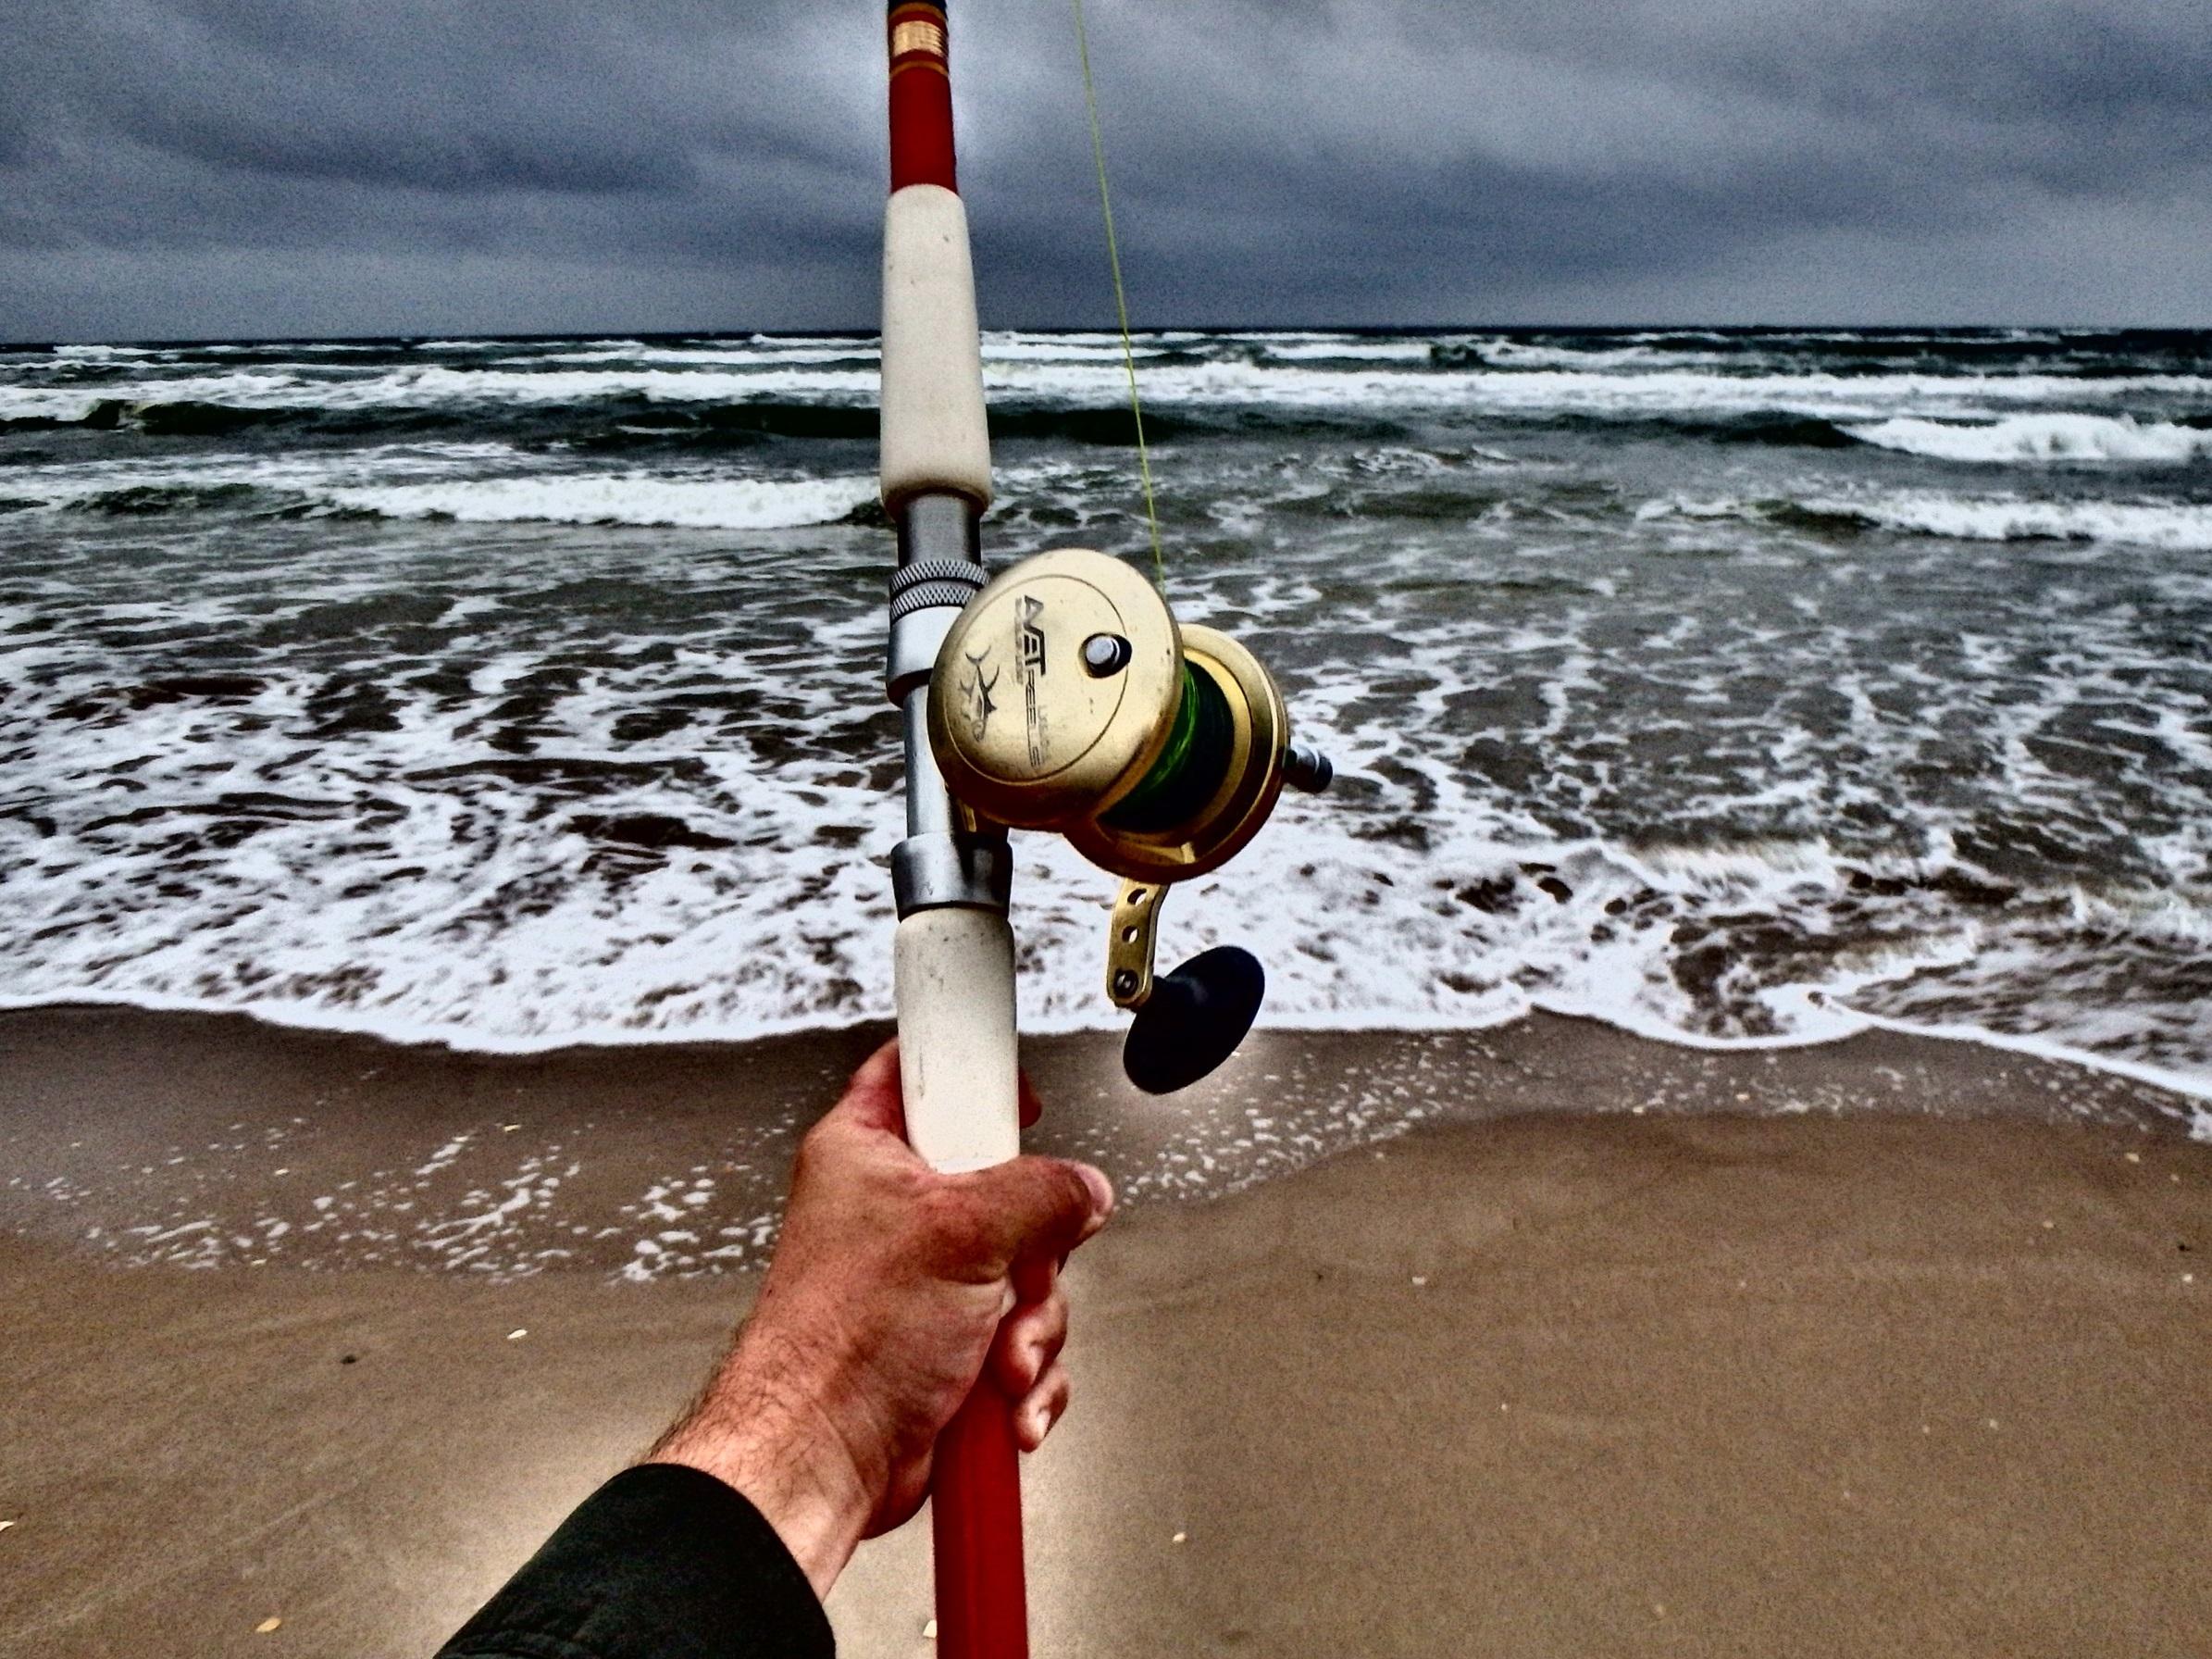 Big storm from the west, high winds, rain, falling pressure. - Padre Island National Seashore